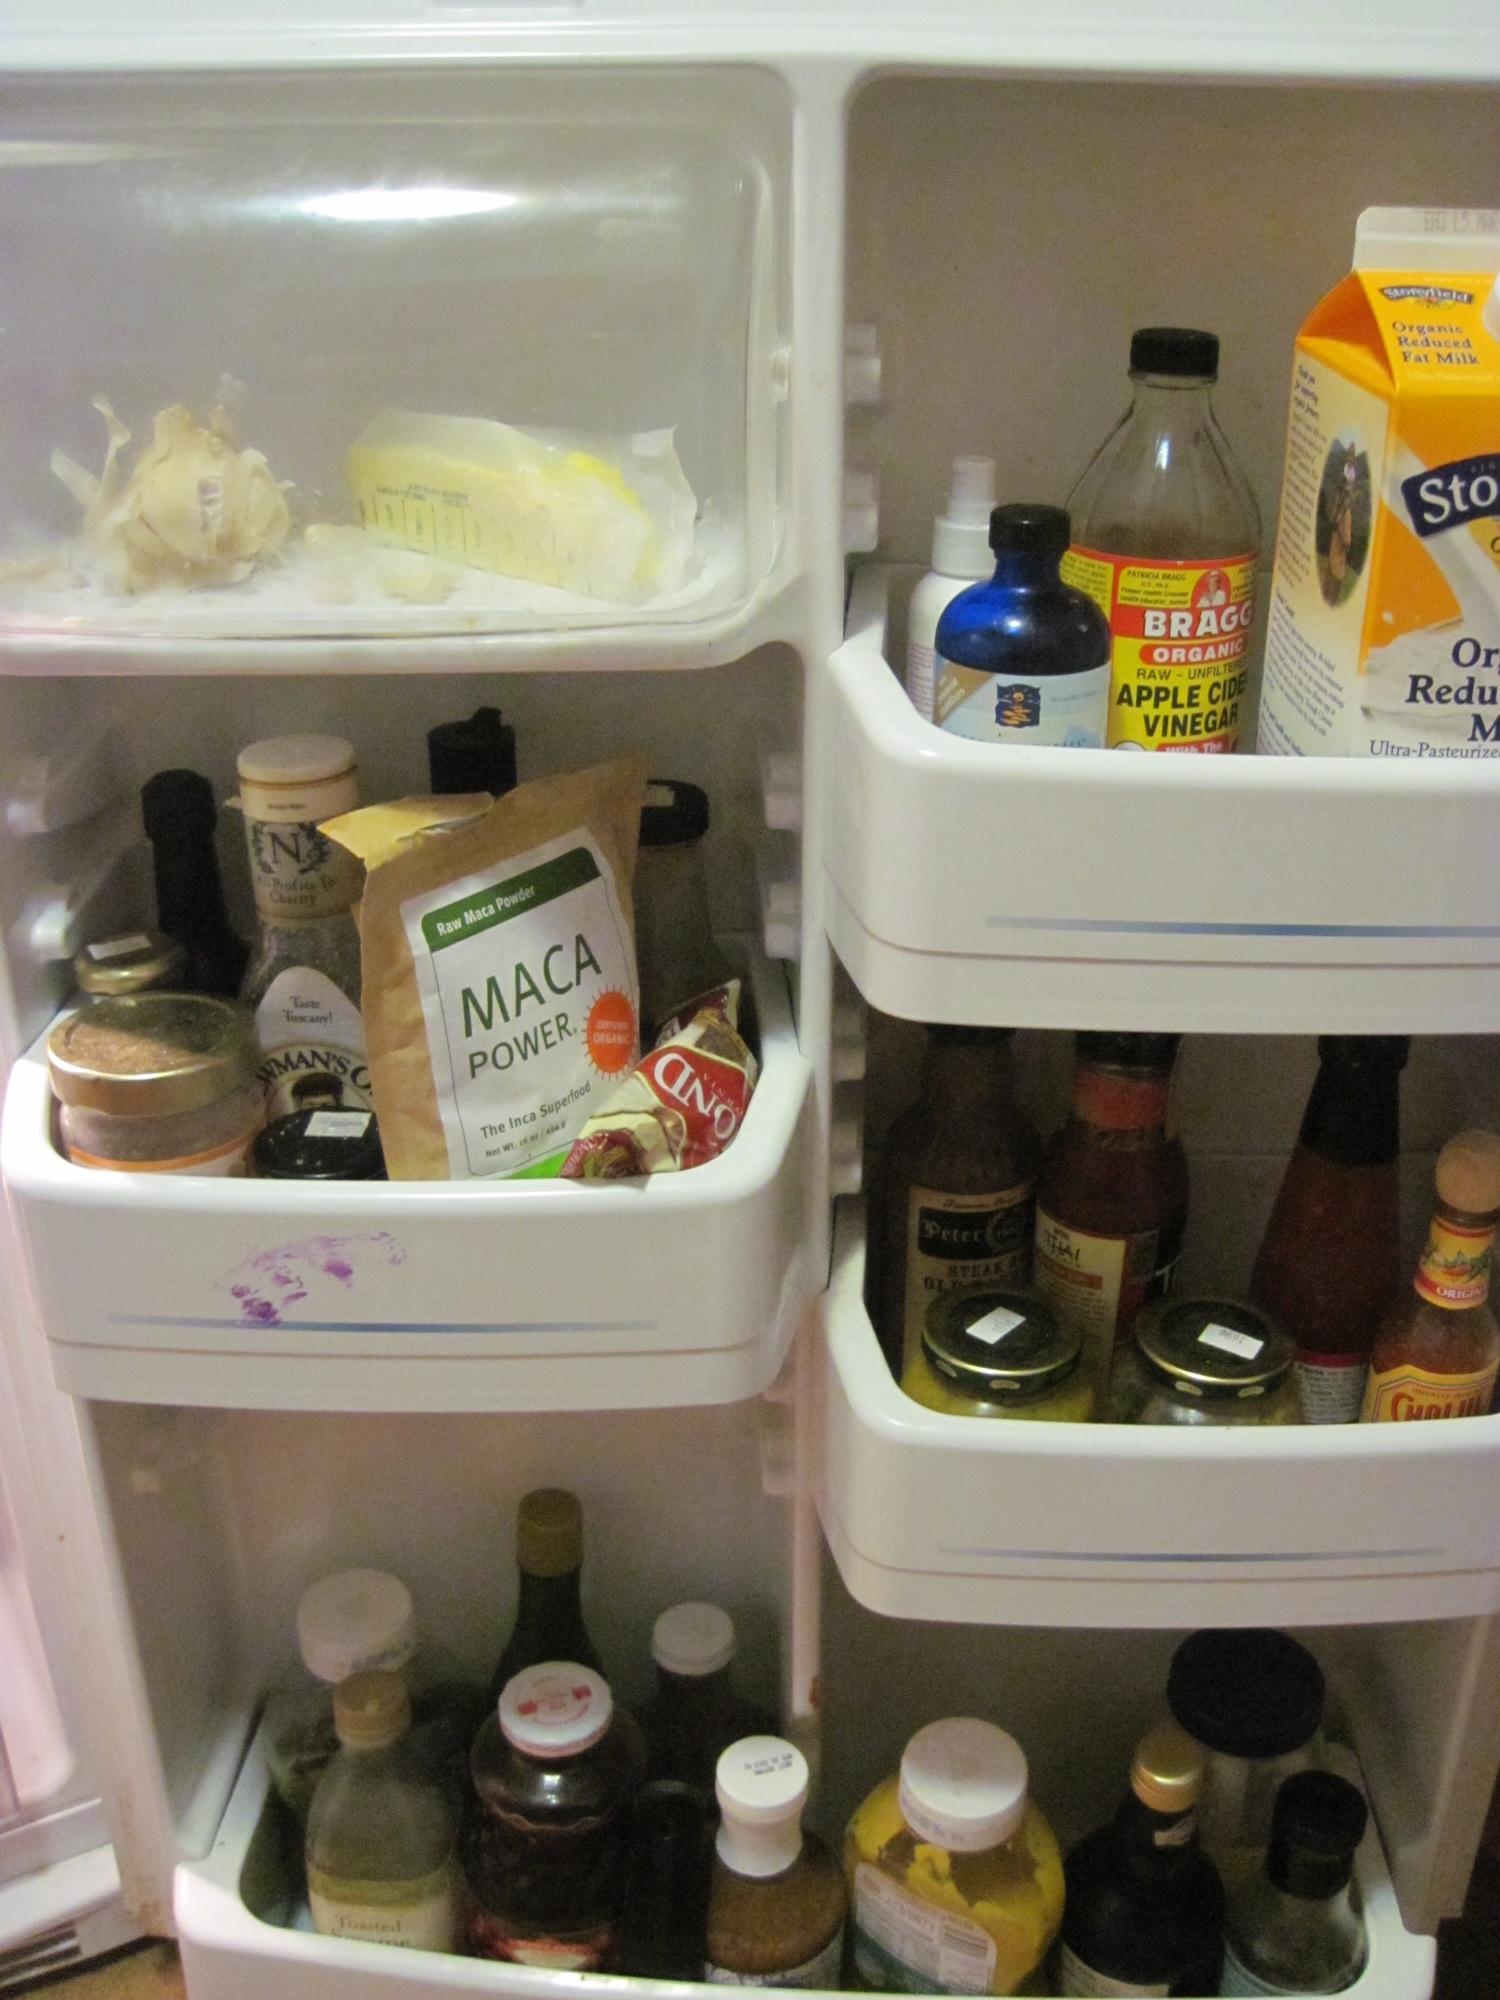 A close up of full fridge shelves